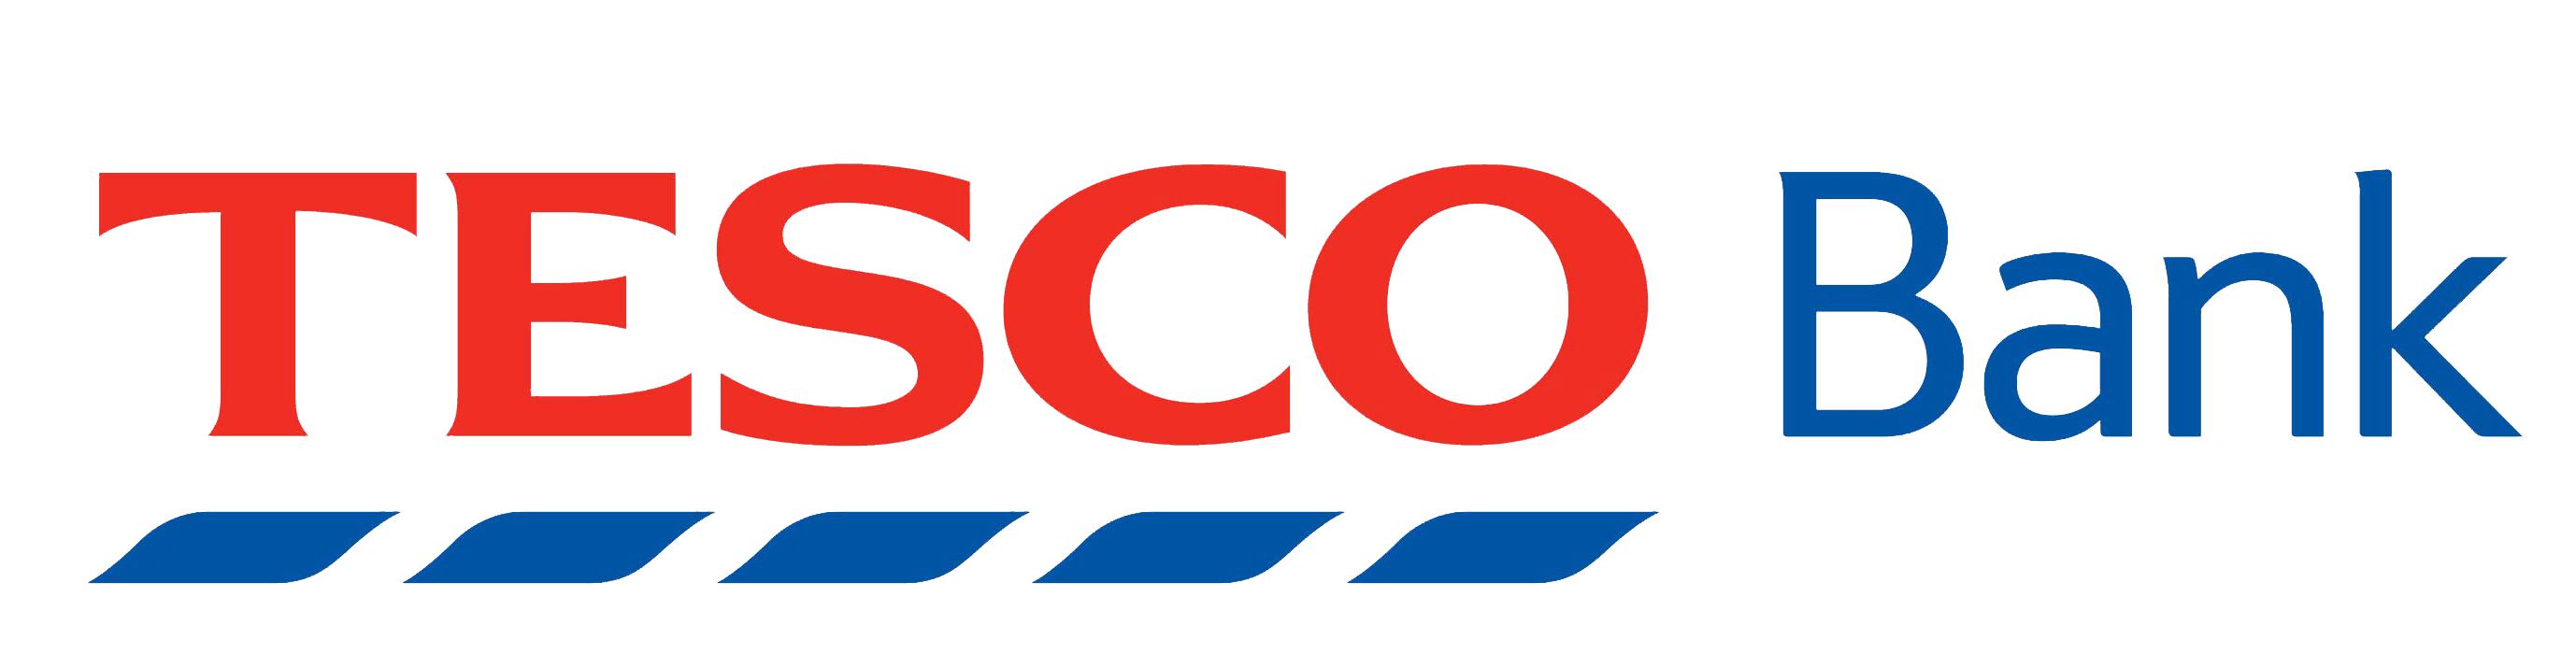 Tesco-Bank.png